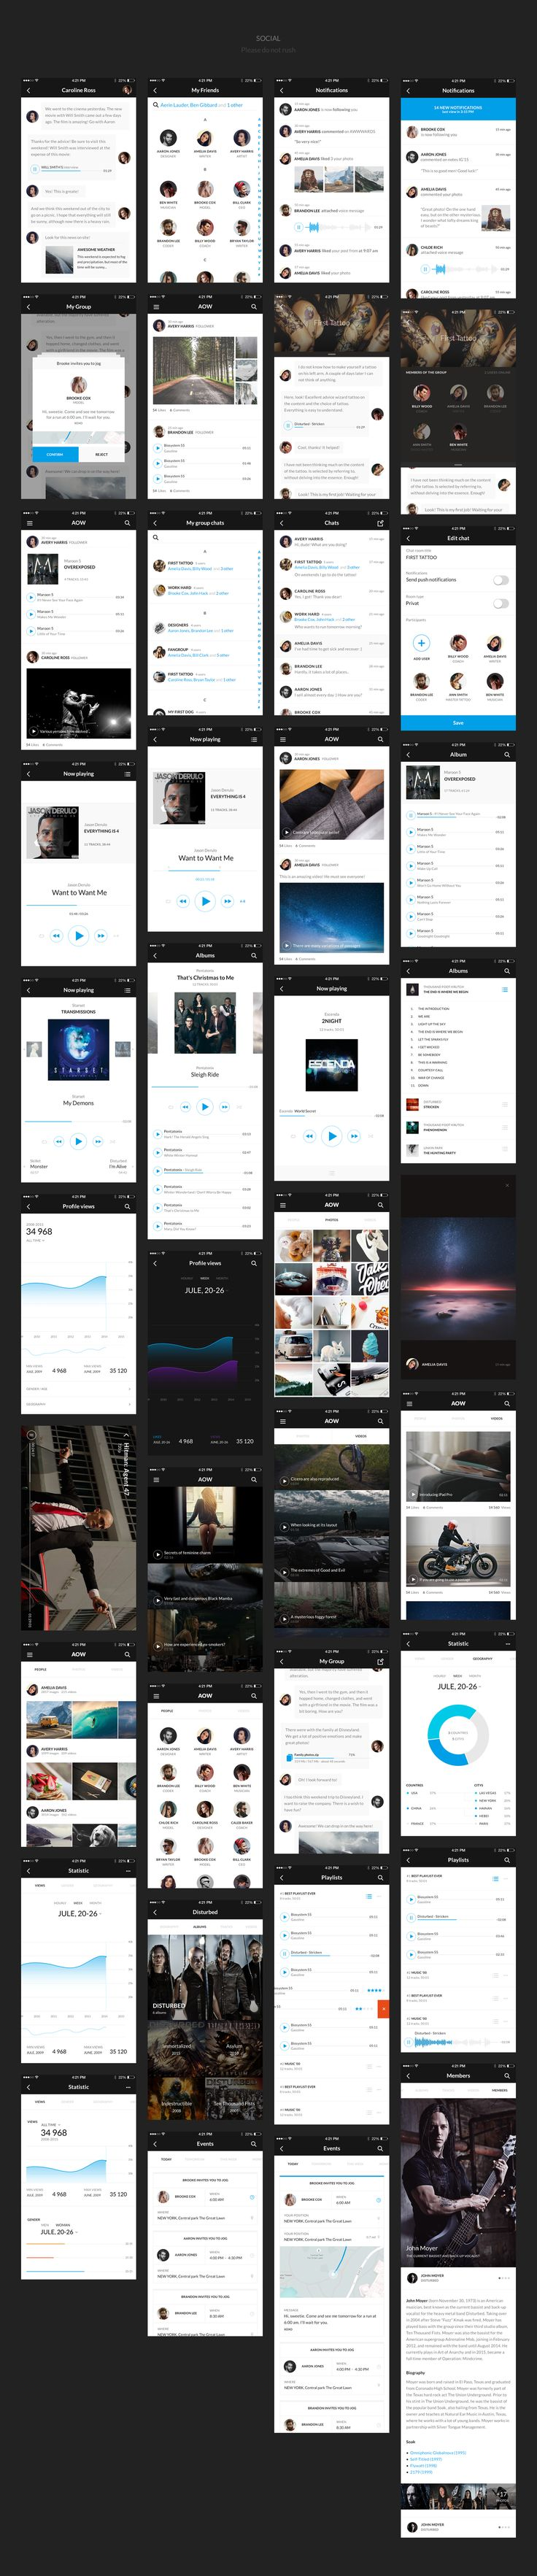 #Be #behance #web #website #design #UI #UX #site #webdesign #website #app #AOW #UI #UIkit #mobile #social #ios